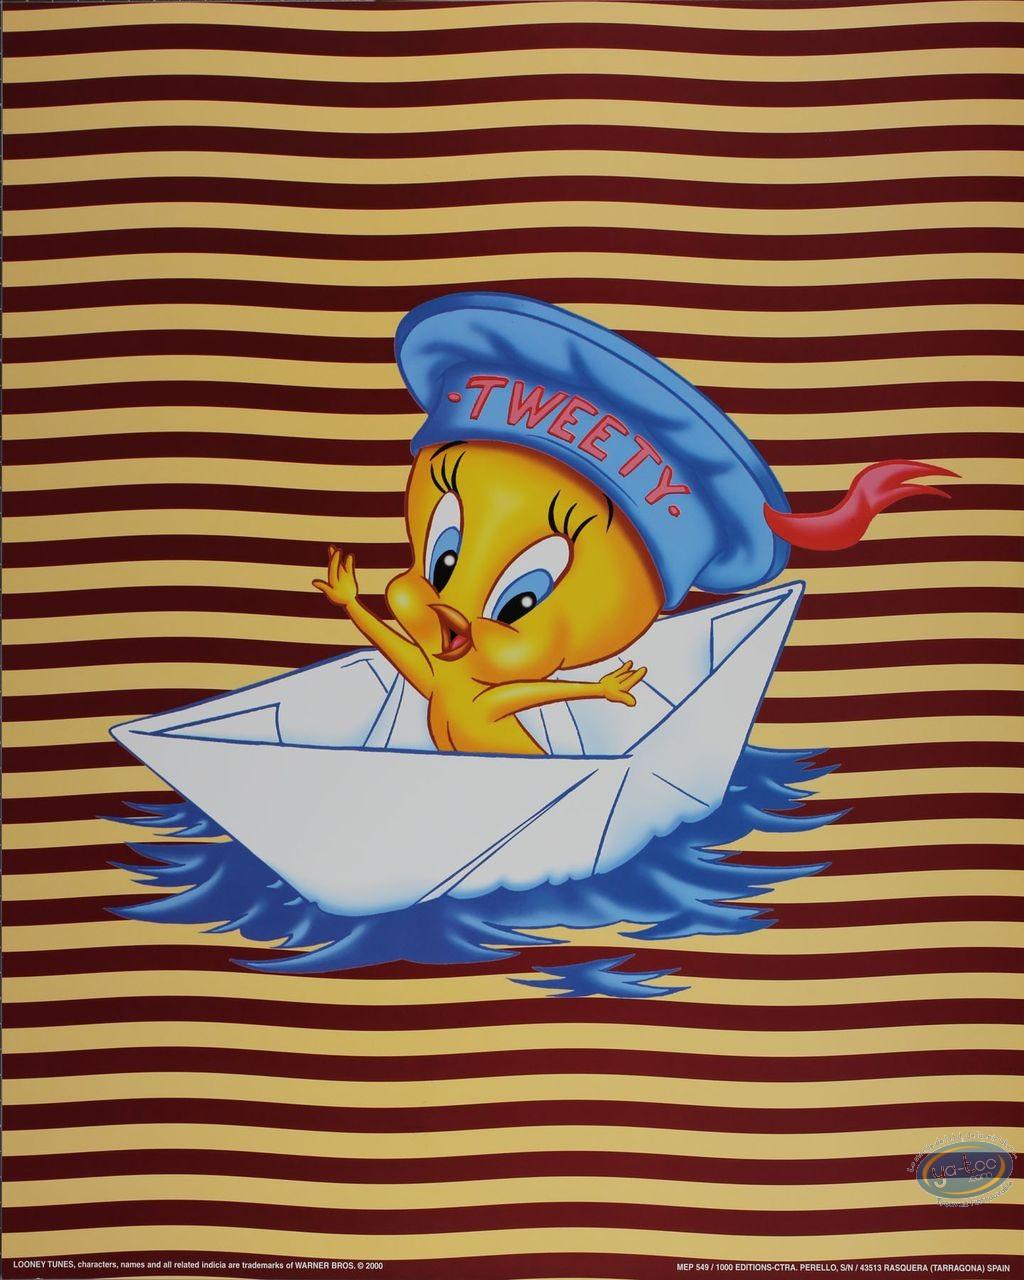 Affiche Offset, Titi : Titi marin 40X50 cm